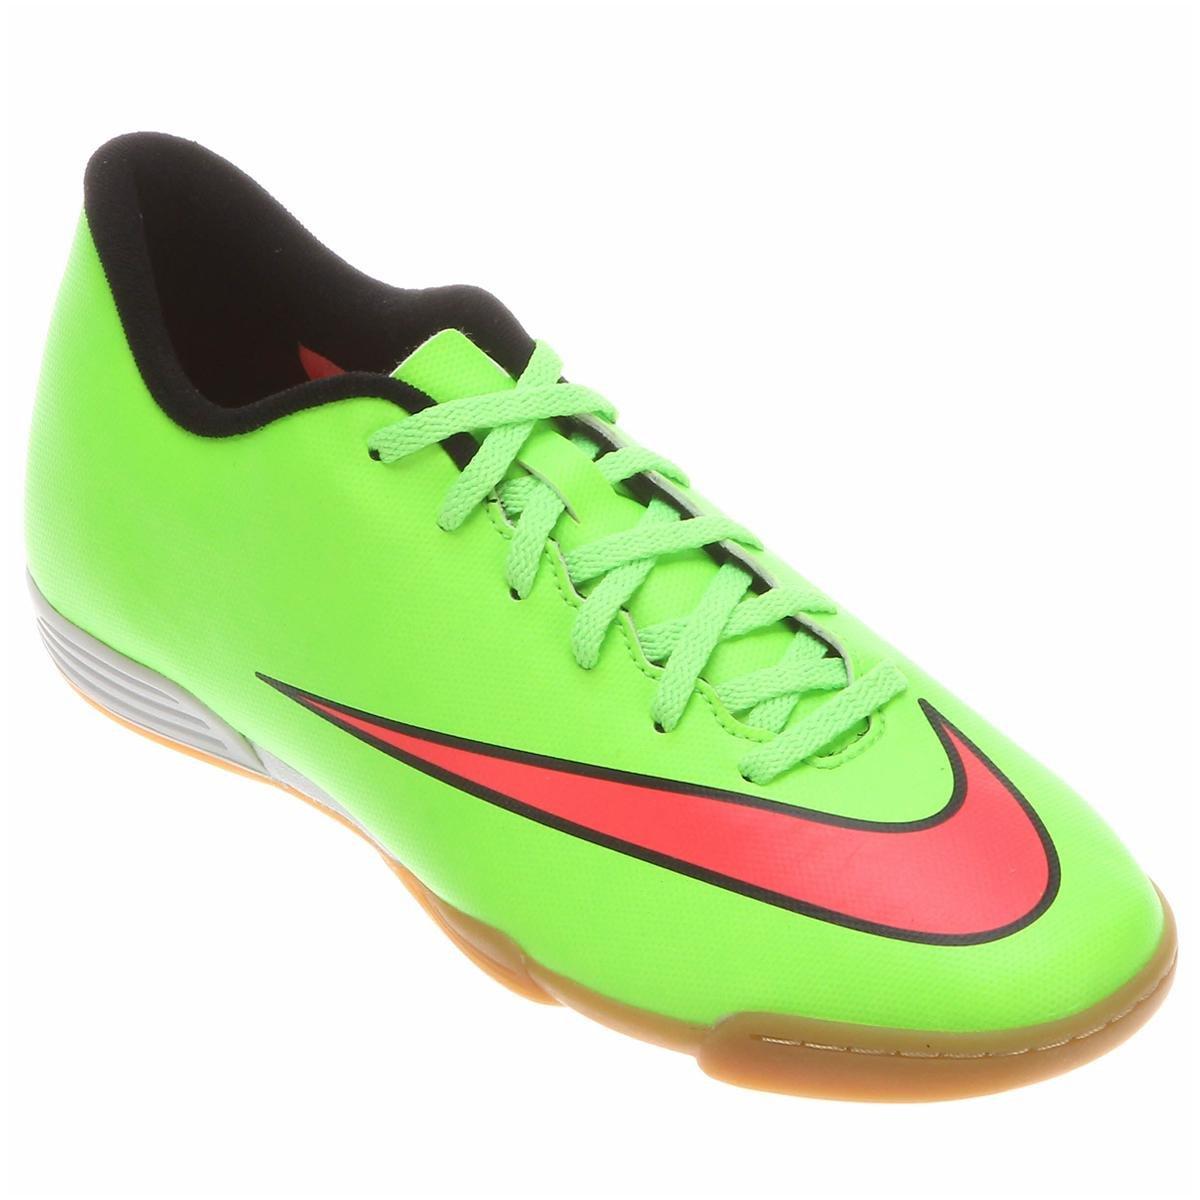 706bb4b16c740 ... czech chuteira futsal nike mercurial vortex 2 ic masculina compre agora  netshoes c8953 89649 ...